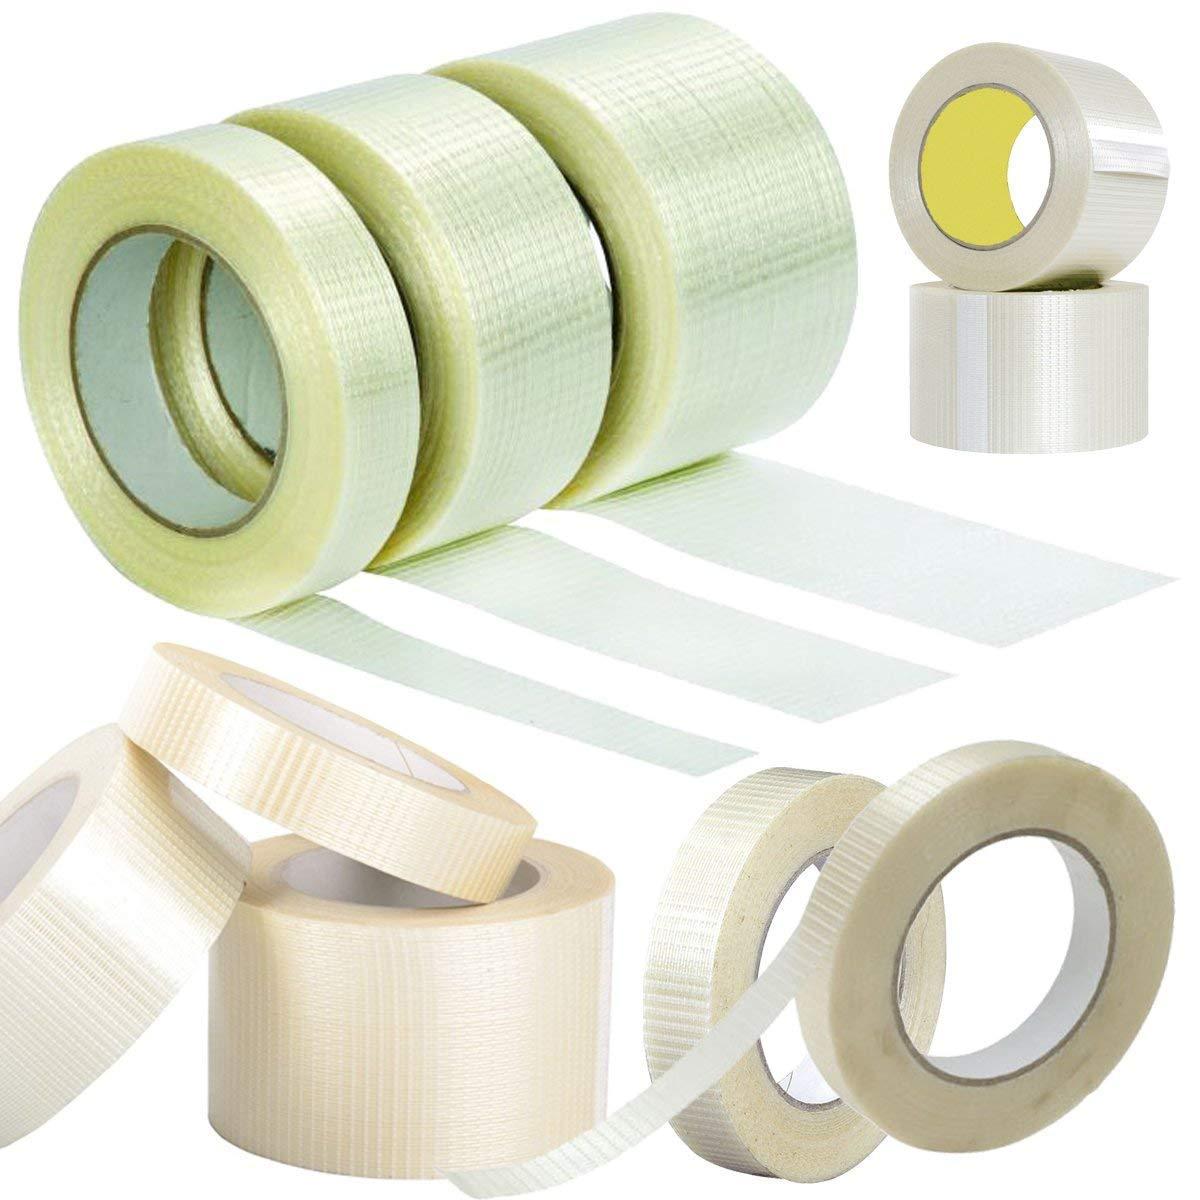 Comtechlogic® CM-5095 Extra Strong Cross Weave Fibreglass Reinforced Filament Tape Heavy Duty Tear Resistant Packaging Parcel Box Sealing Packing Tape (1, 50mm x 50M) Comtechlogic®